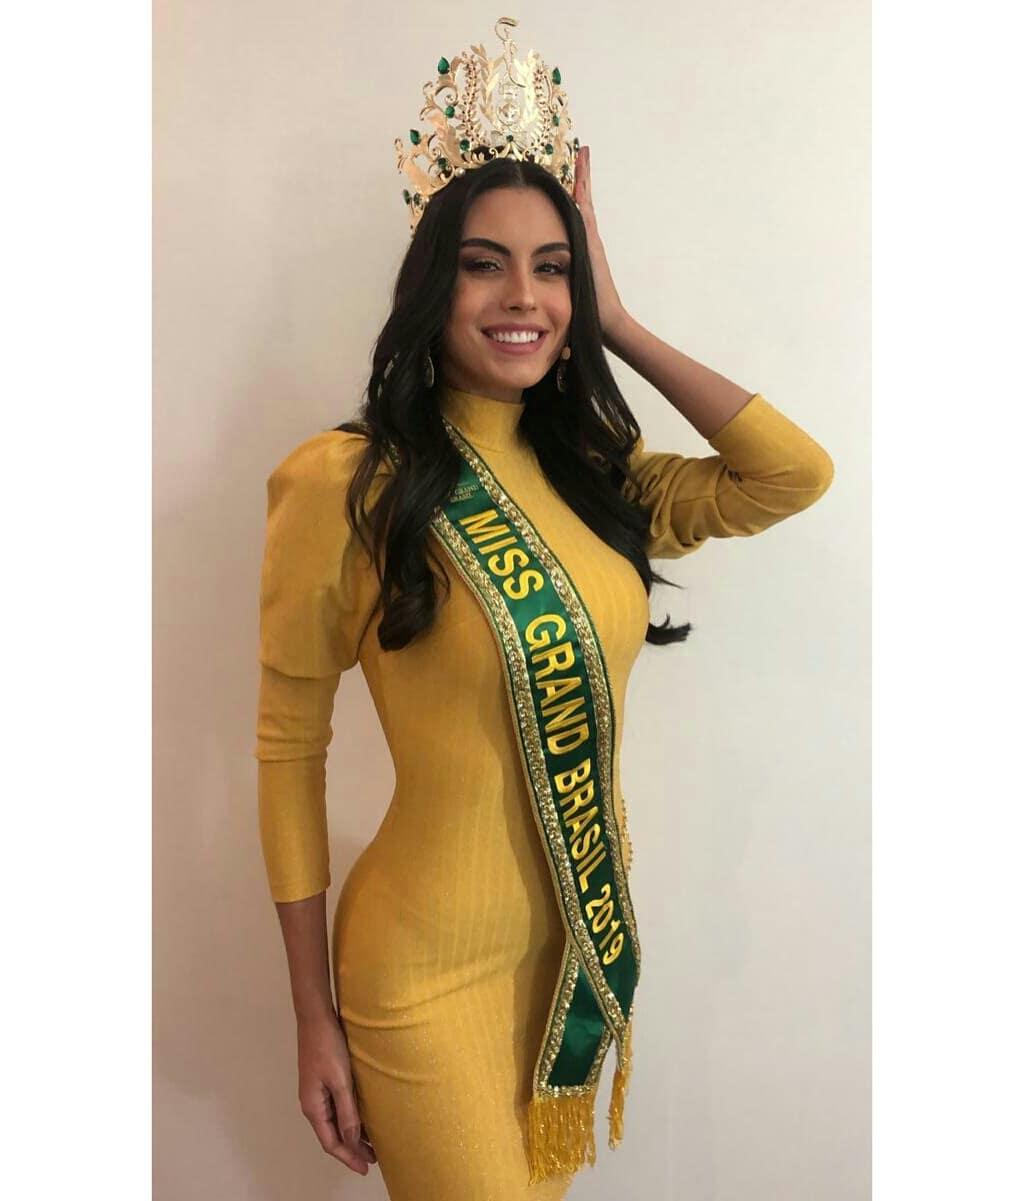 marjorie marcelle, miss grand brasil 2019. - Página 4 Alex-108